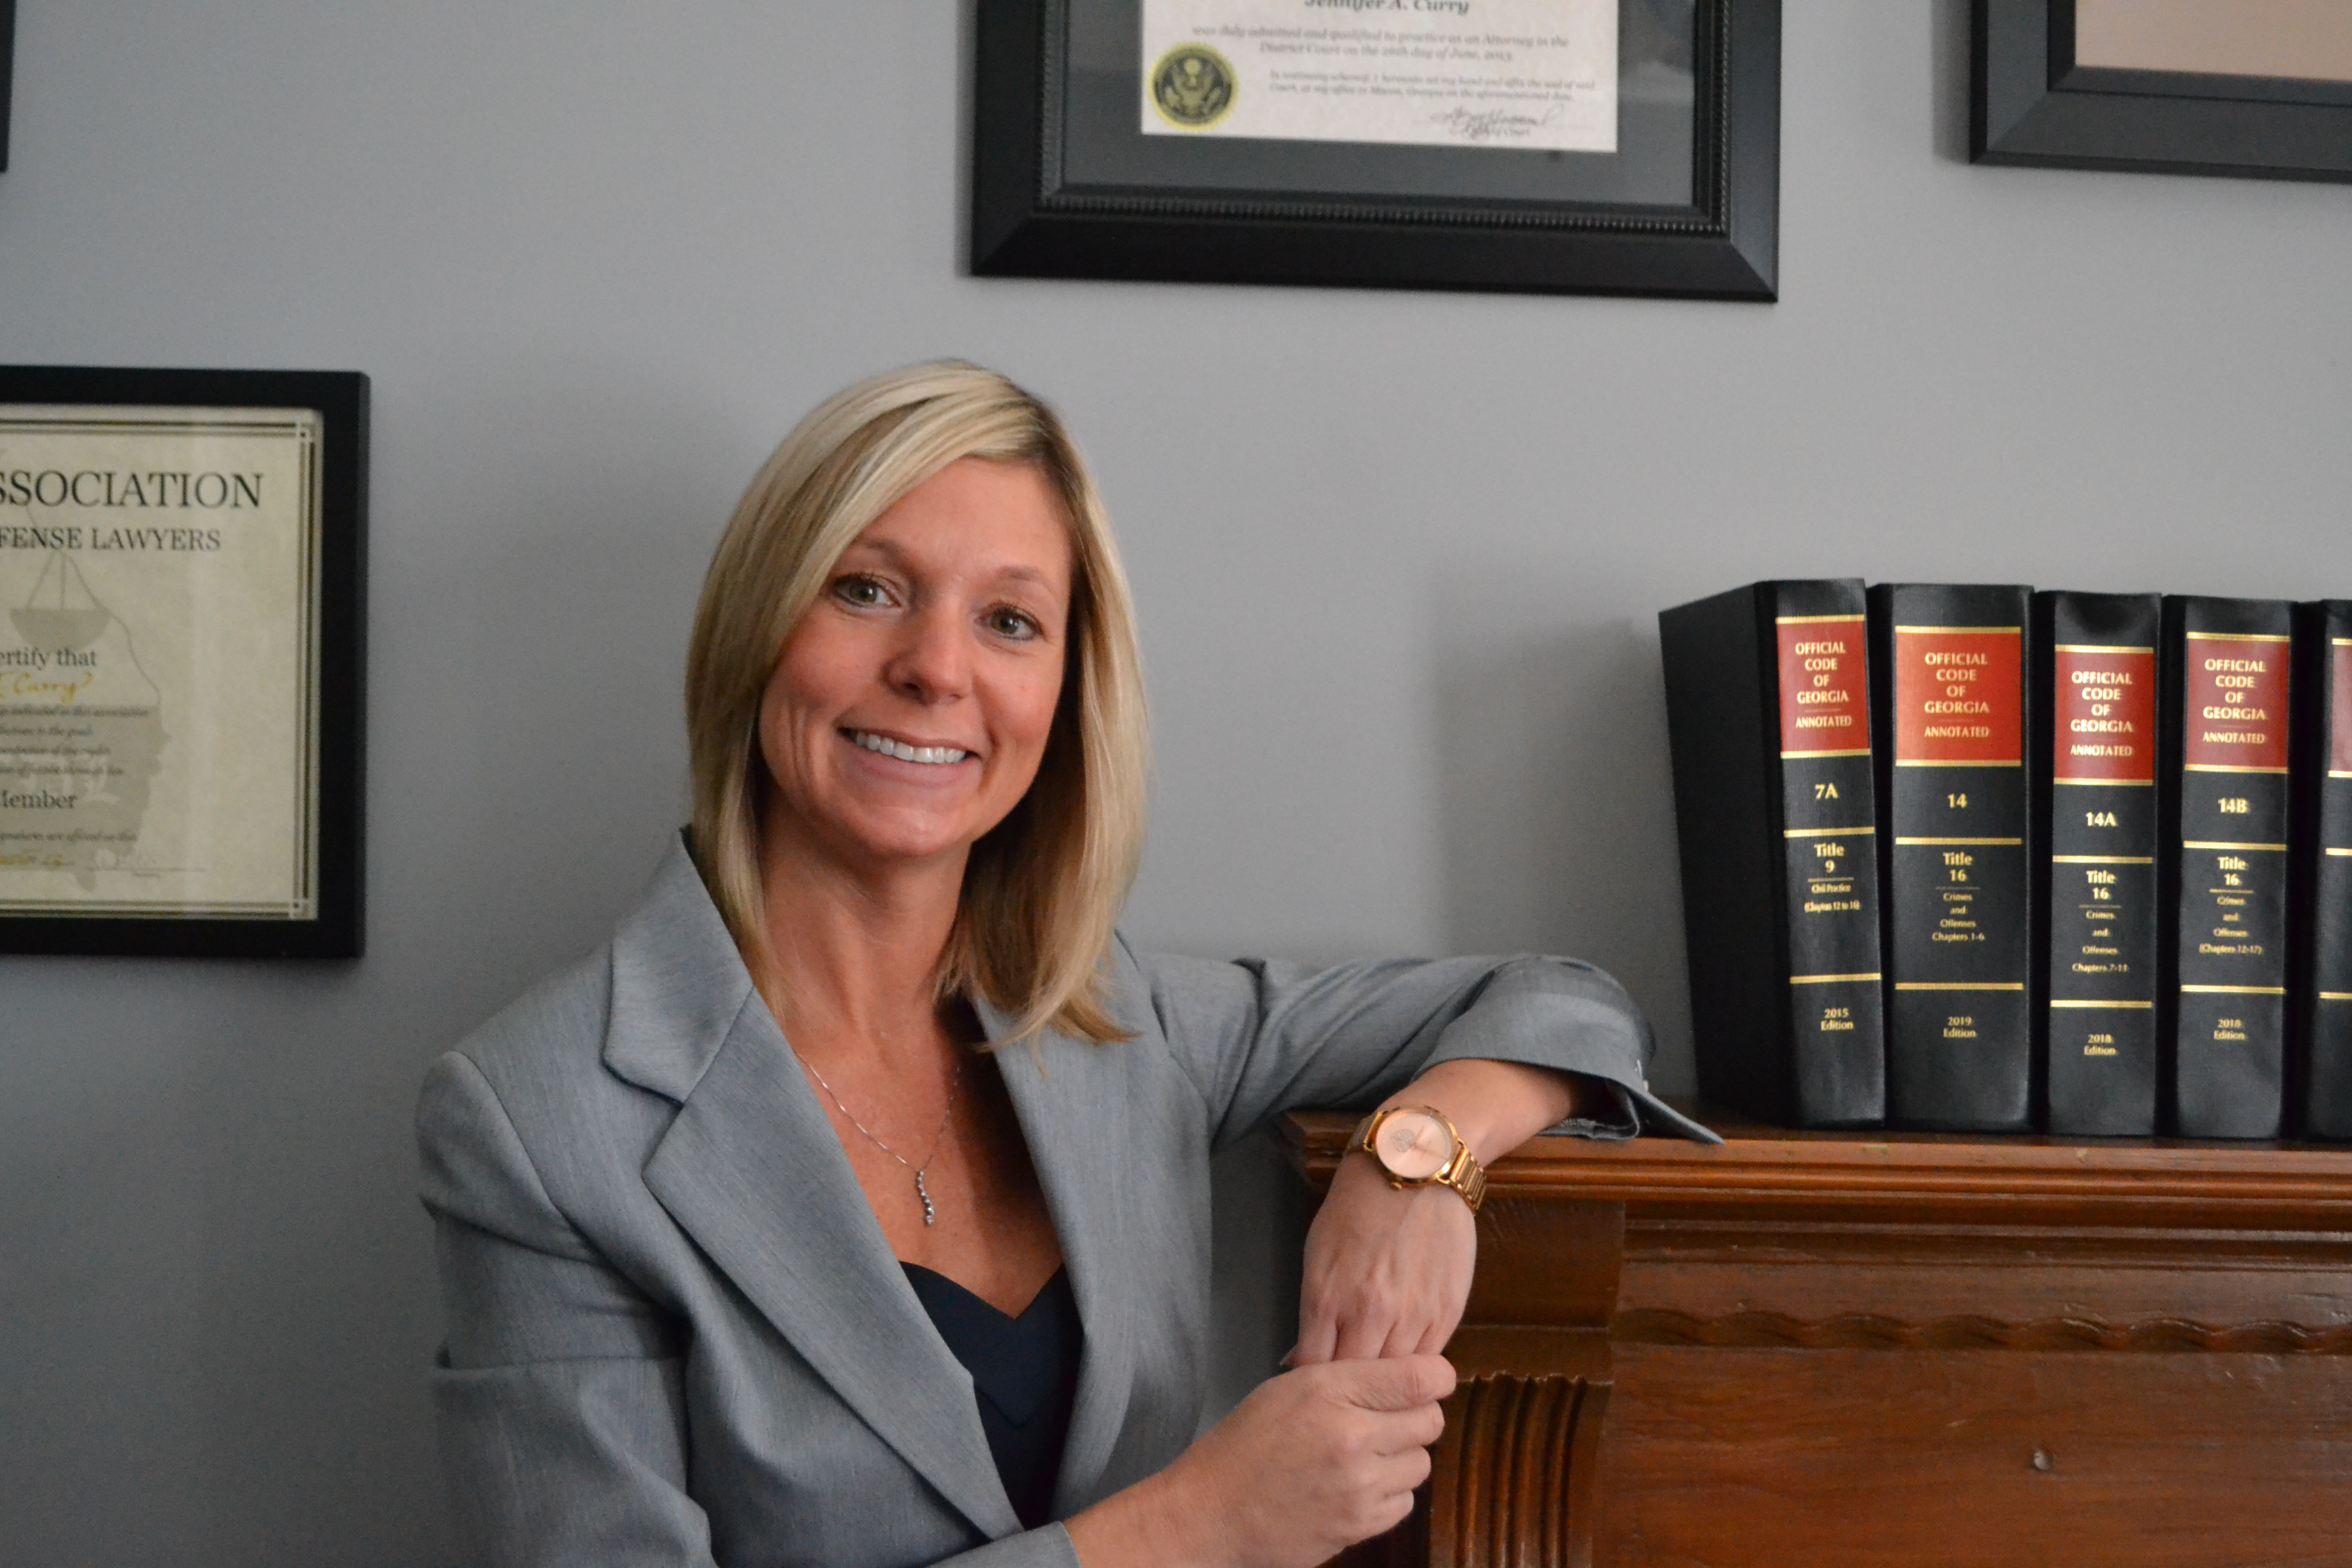 jennifer curry attorney, experienced criminal defense attorney in columbus ga